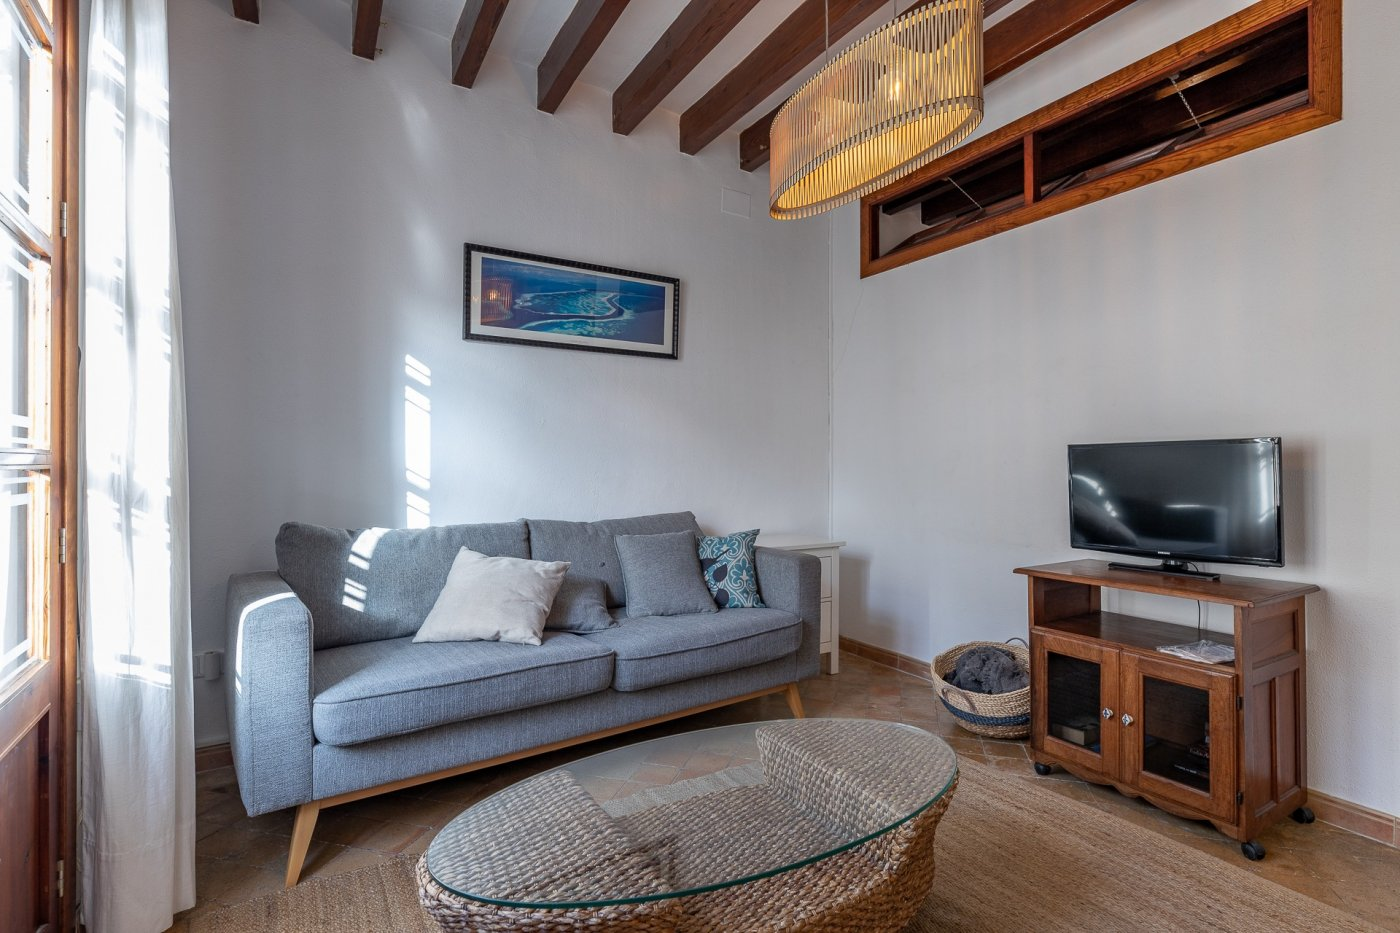 Espectacular apartamento en centro de palma - imagenInmueble6